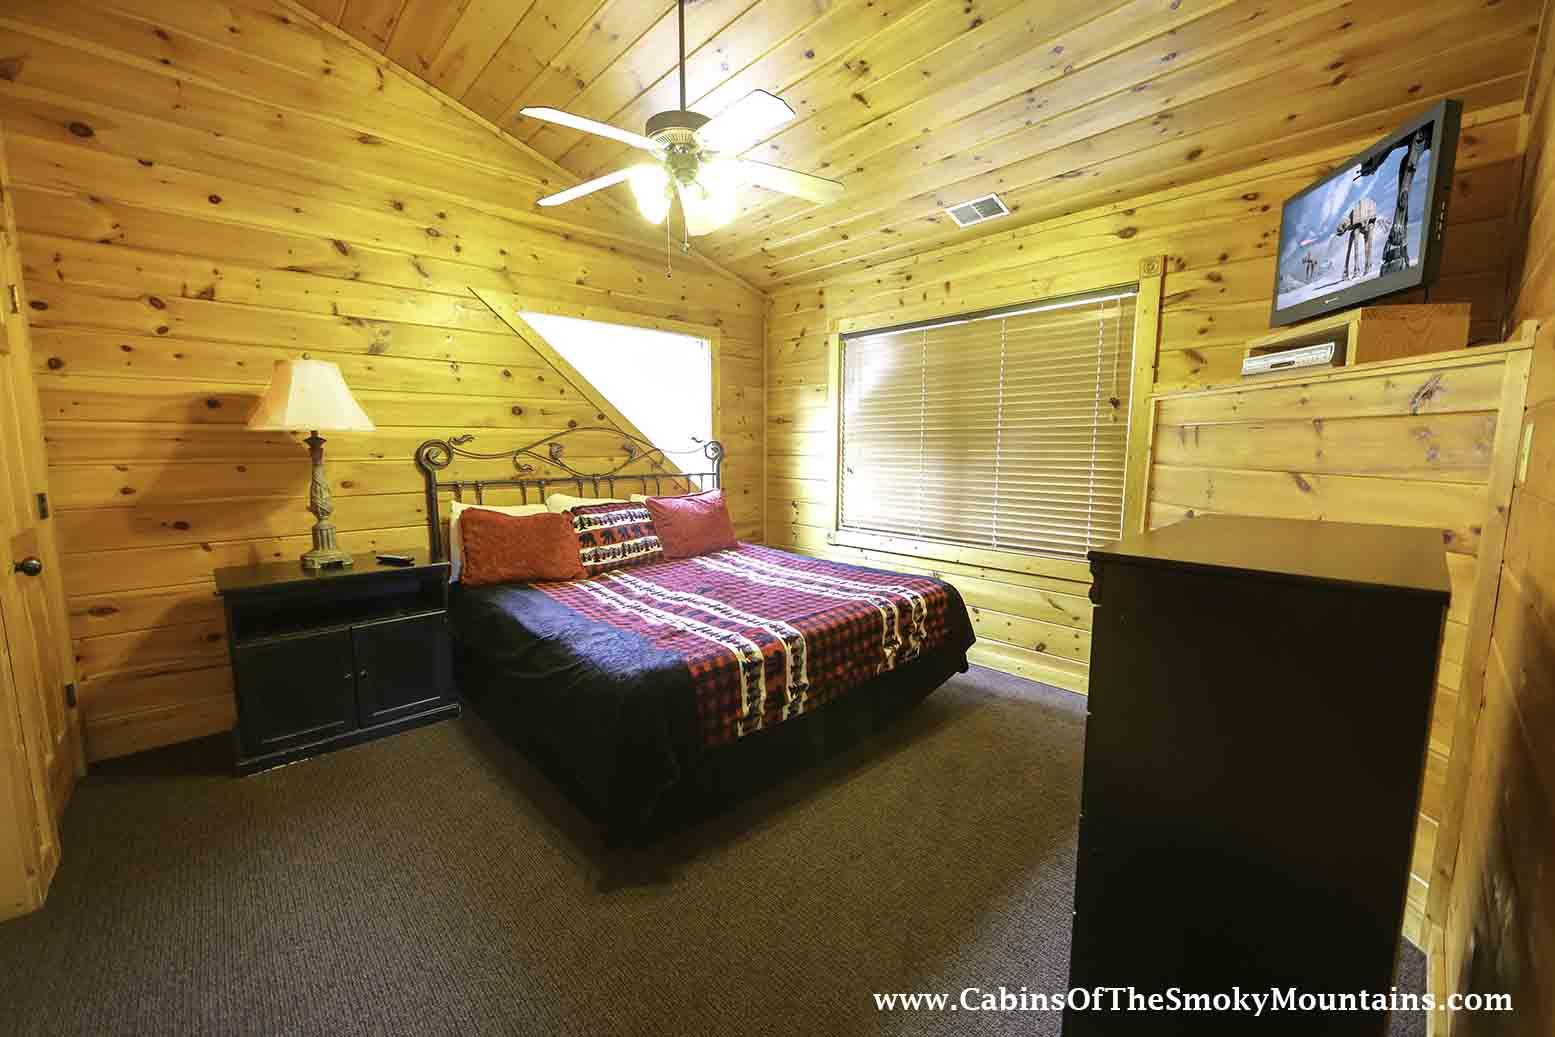 Gatlinburg Cabin Daydreamer 39 S Delight 2 Bedroom Sleeps 12 Swimming Pool Access Pet